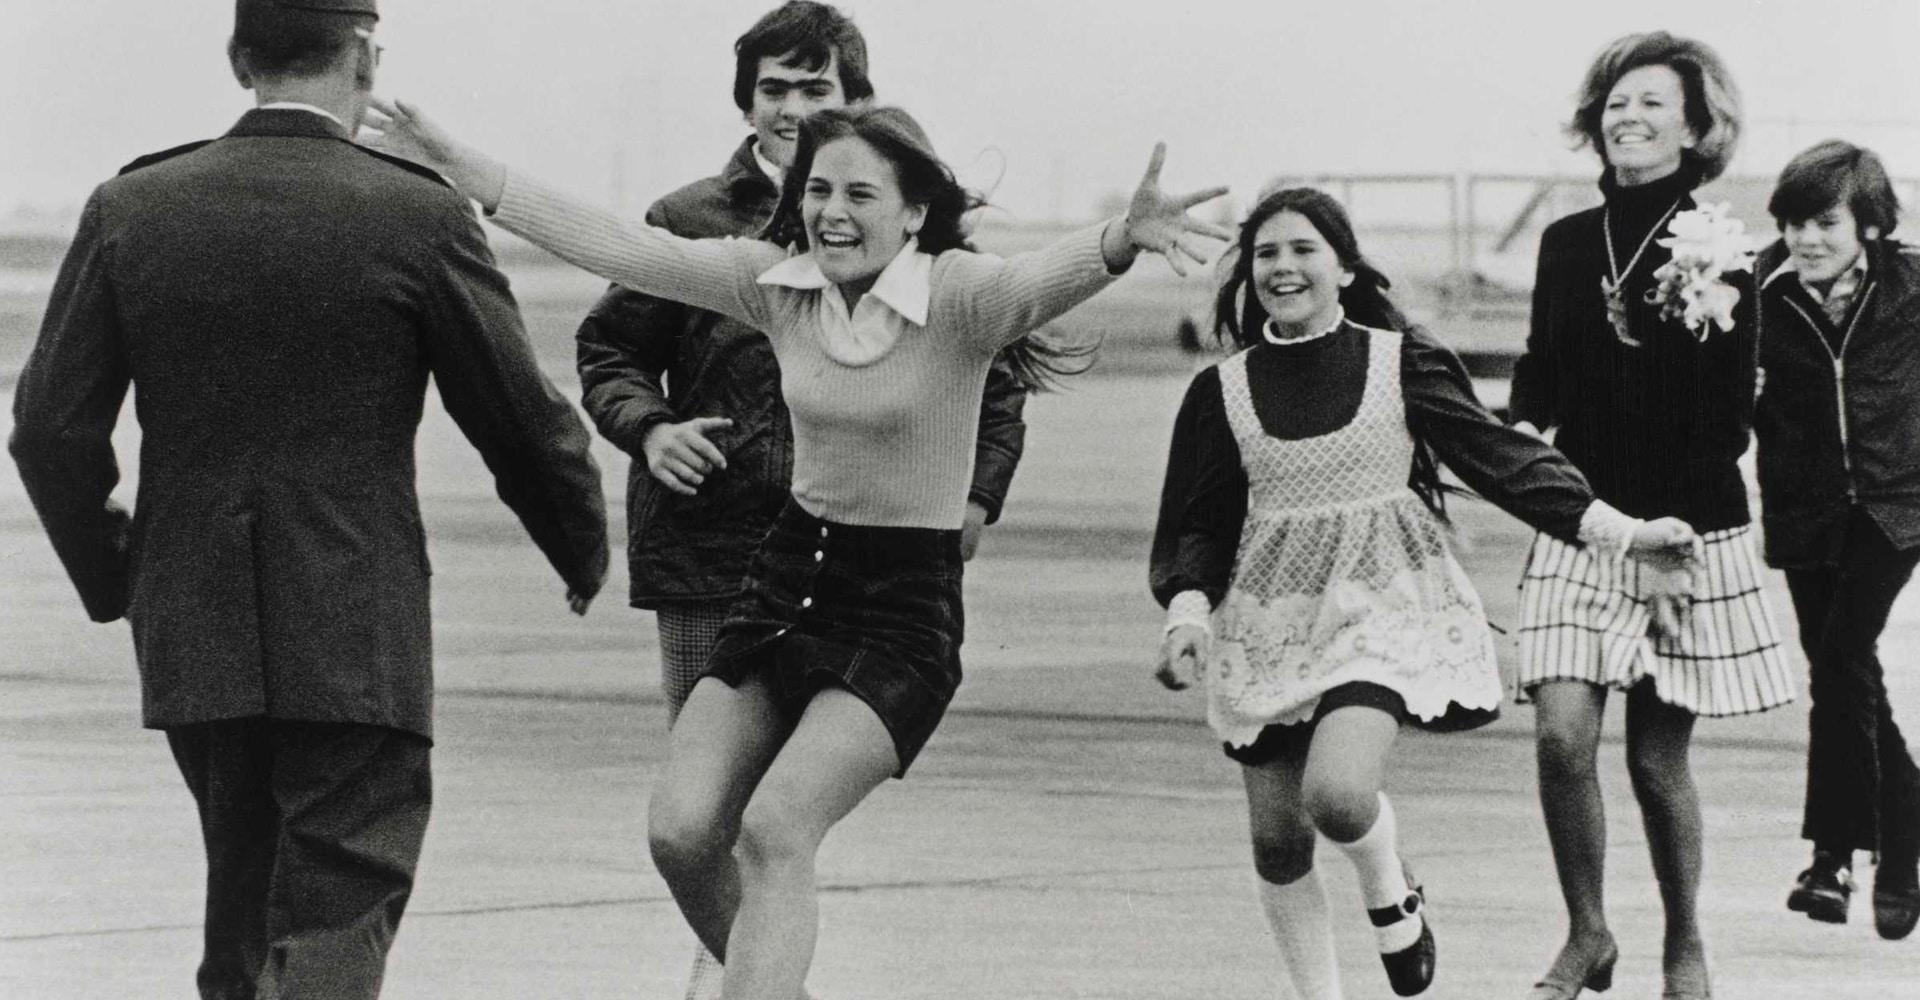 Burst of Joy, Travis Air Force Base - California, March 1973